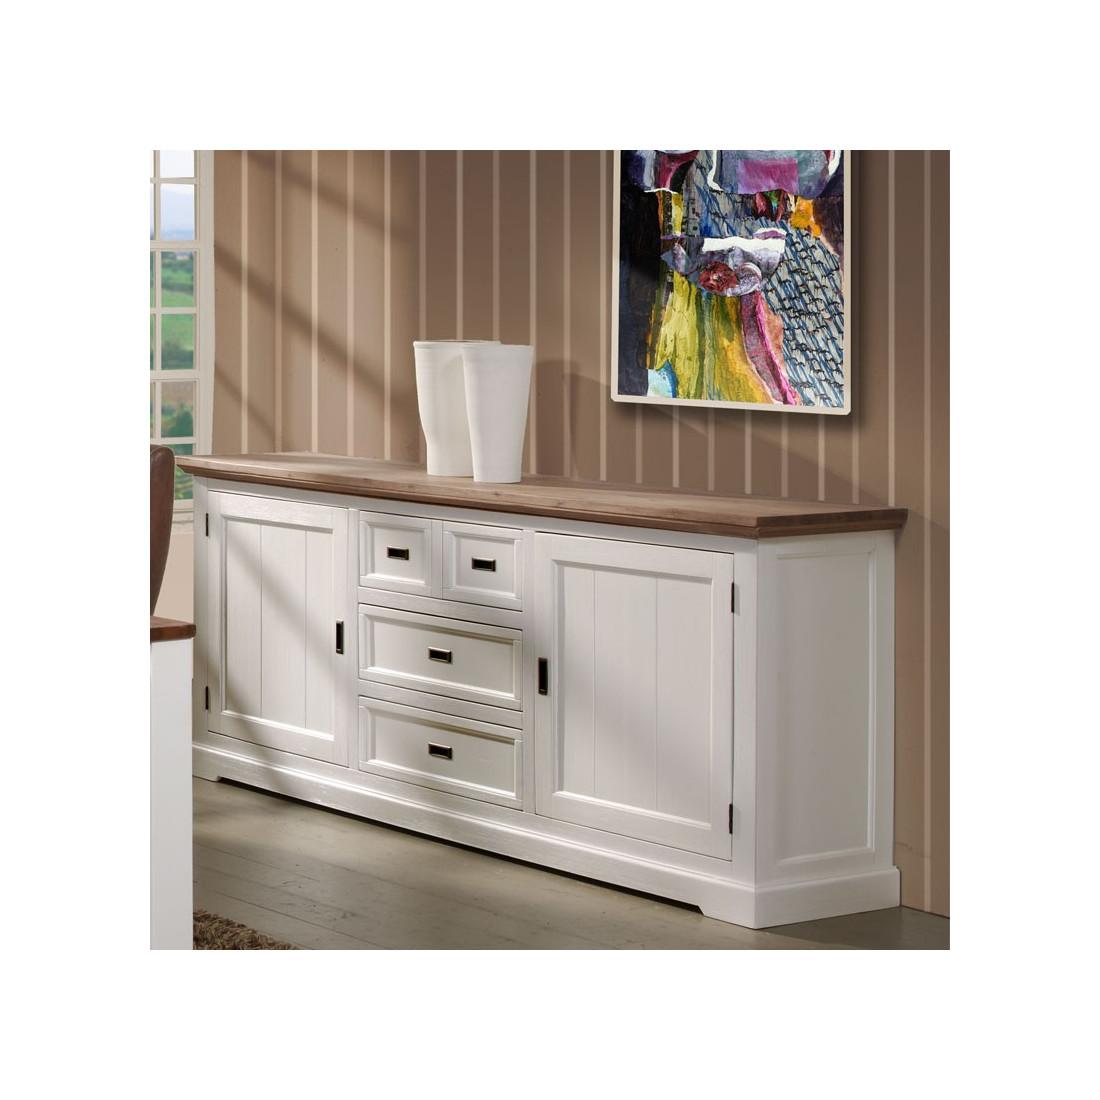 buffet 2 portes 4 tiroirs rio univers salle manger tousmesmeubles. Black Bedroom Furniture Sets. Home Design Ideas